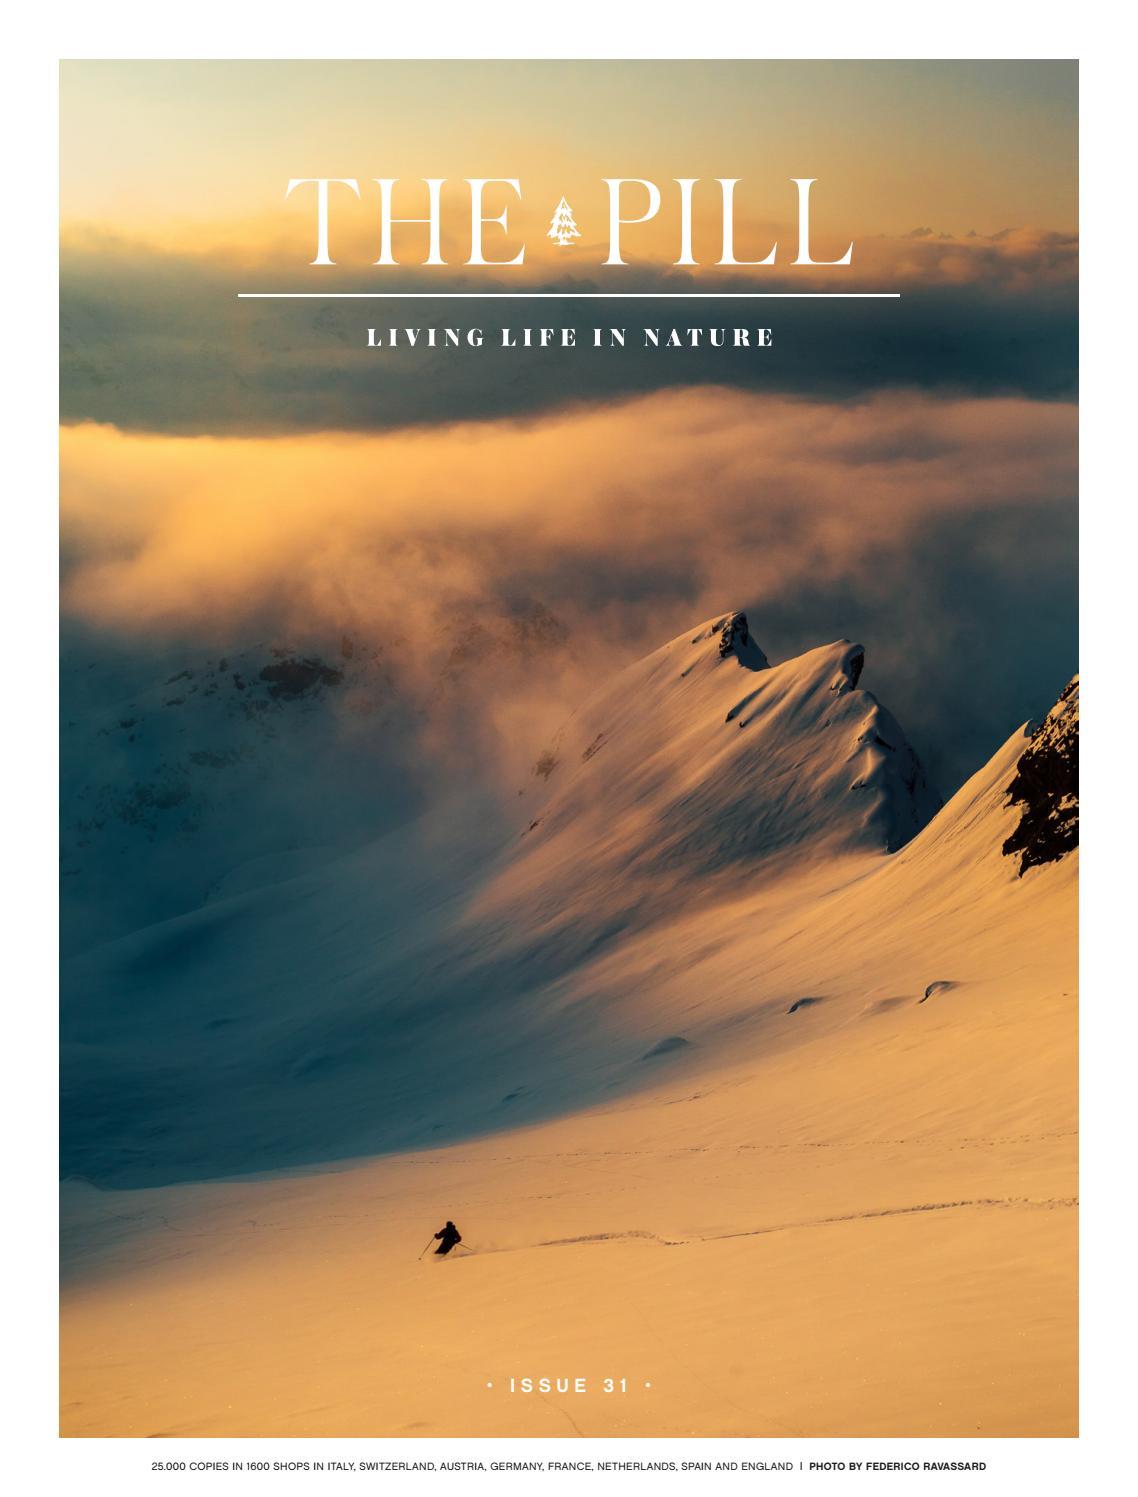 L Arte Di Salire Chiavari the pill magazine 31 en by hand communication - issuu